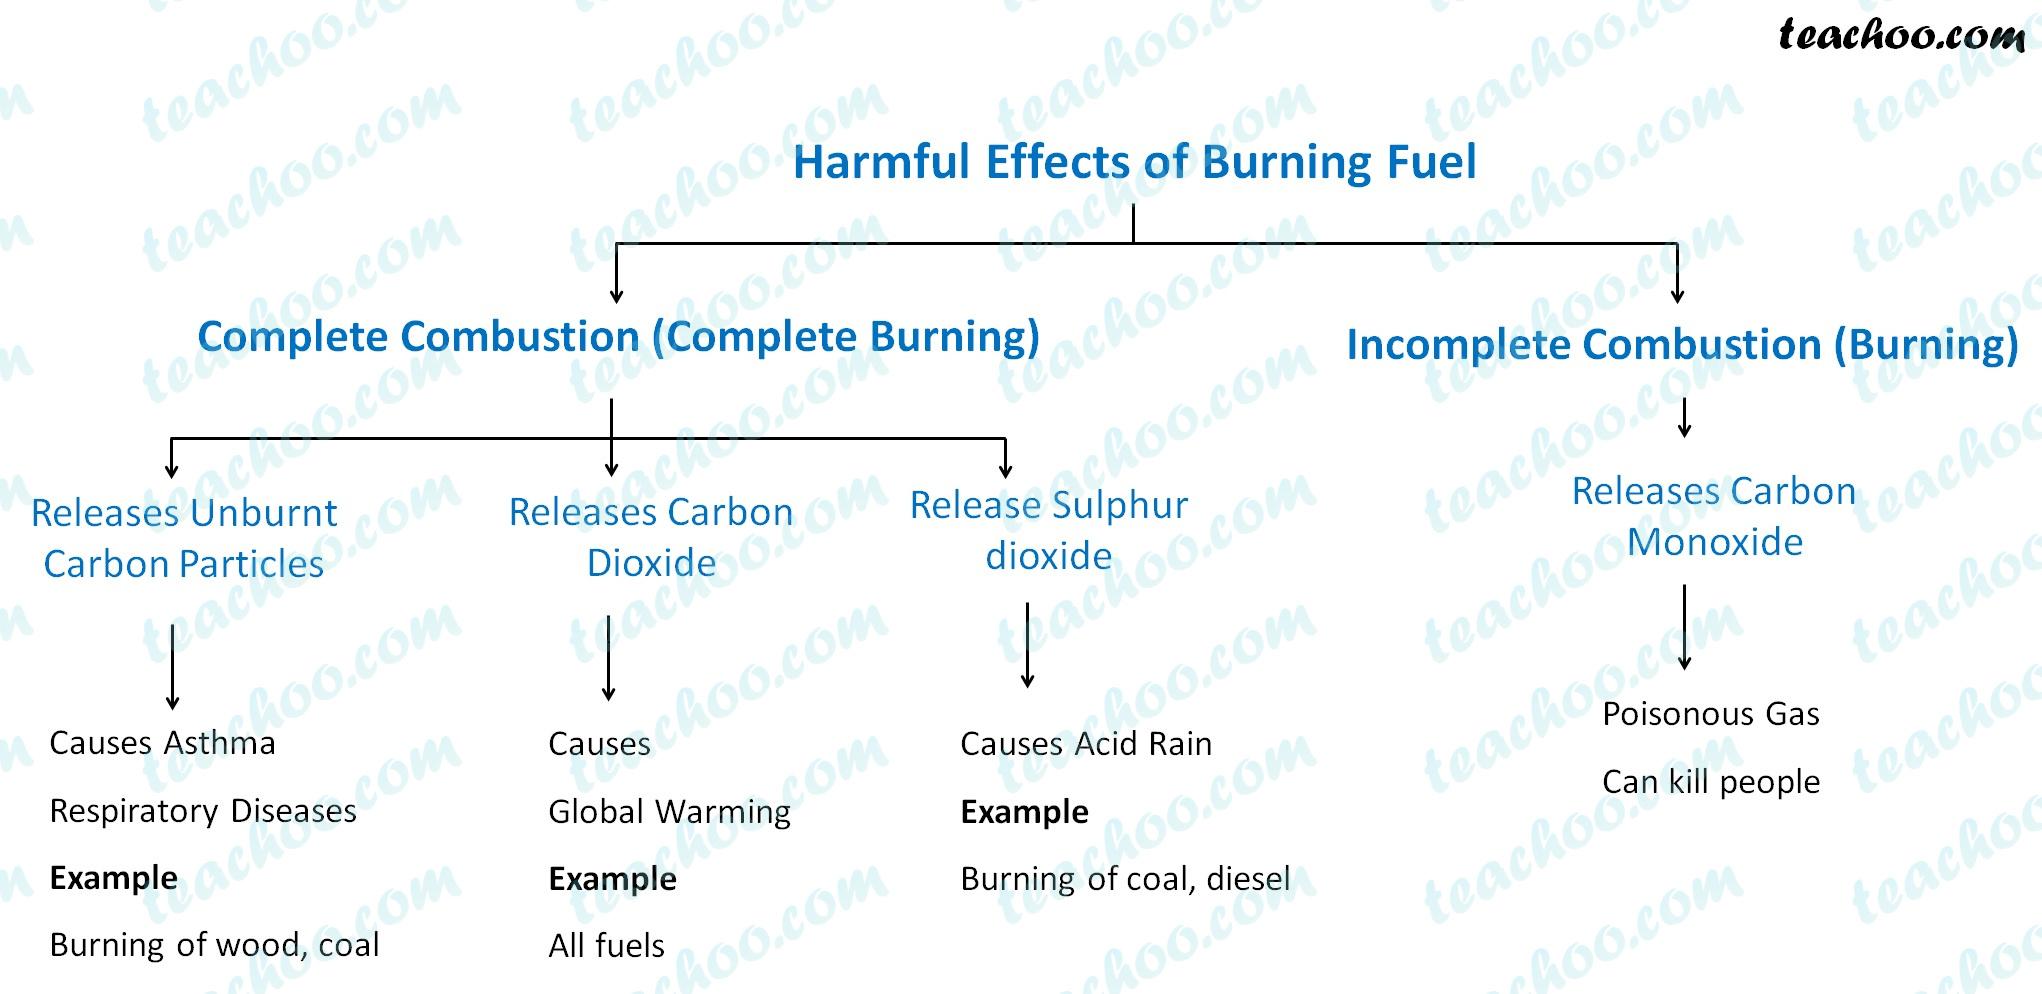 harmful-effects.jpg